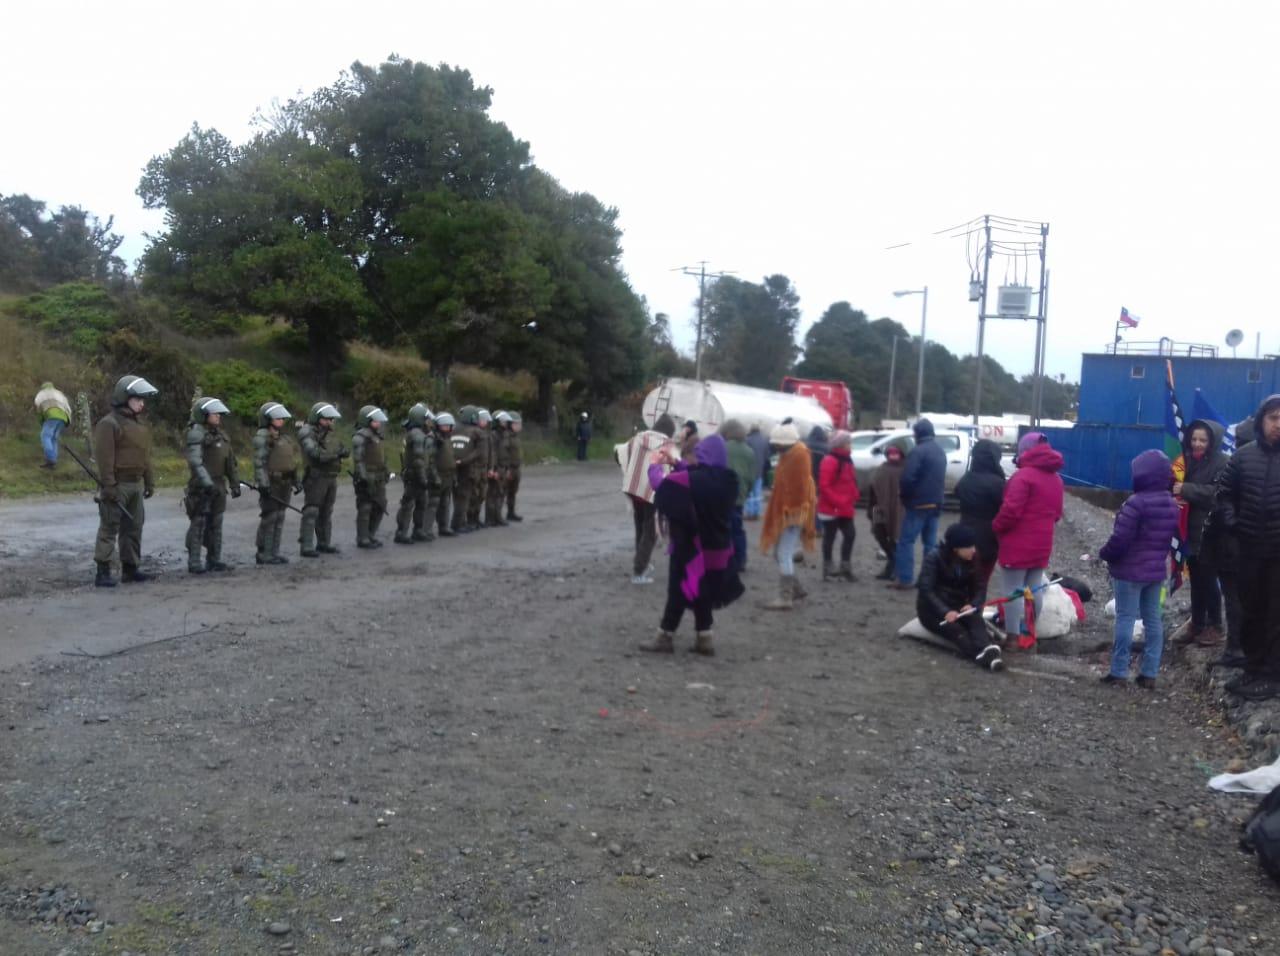 Calbuco: Denuncian operación encubierta de descarga de desechos de barco salmonero Seinkogen